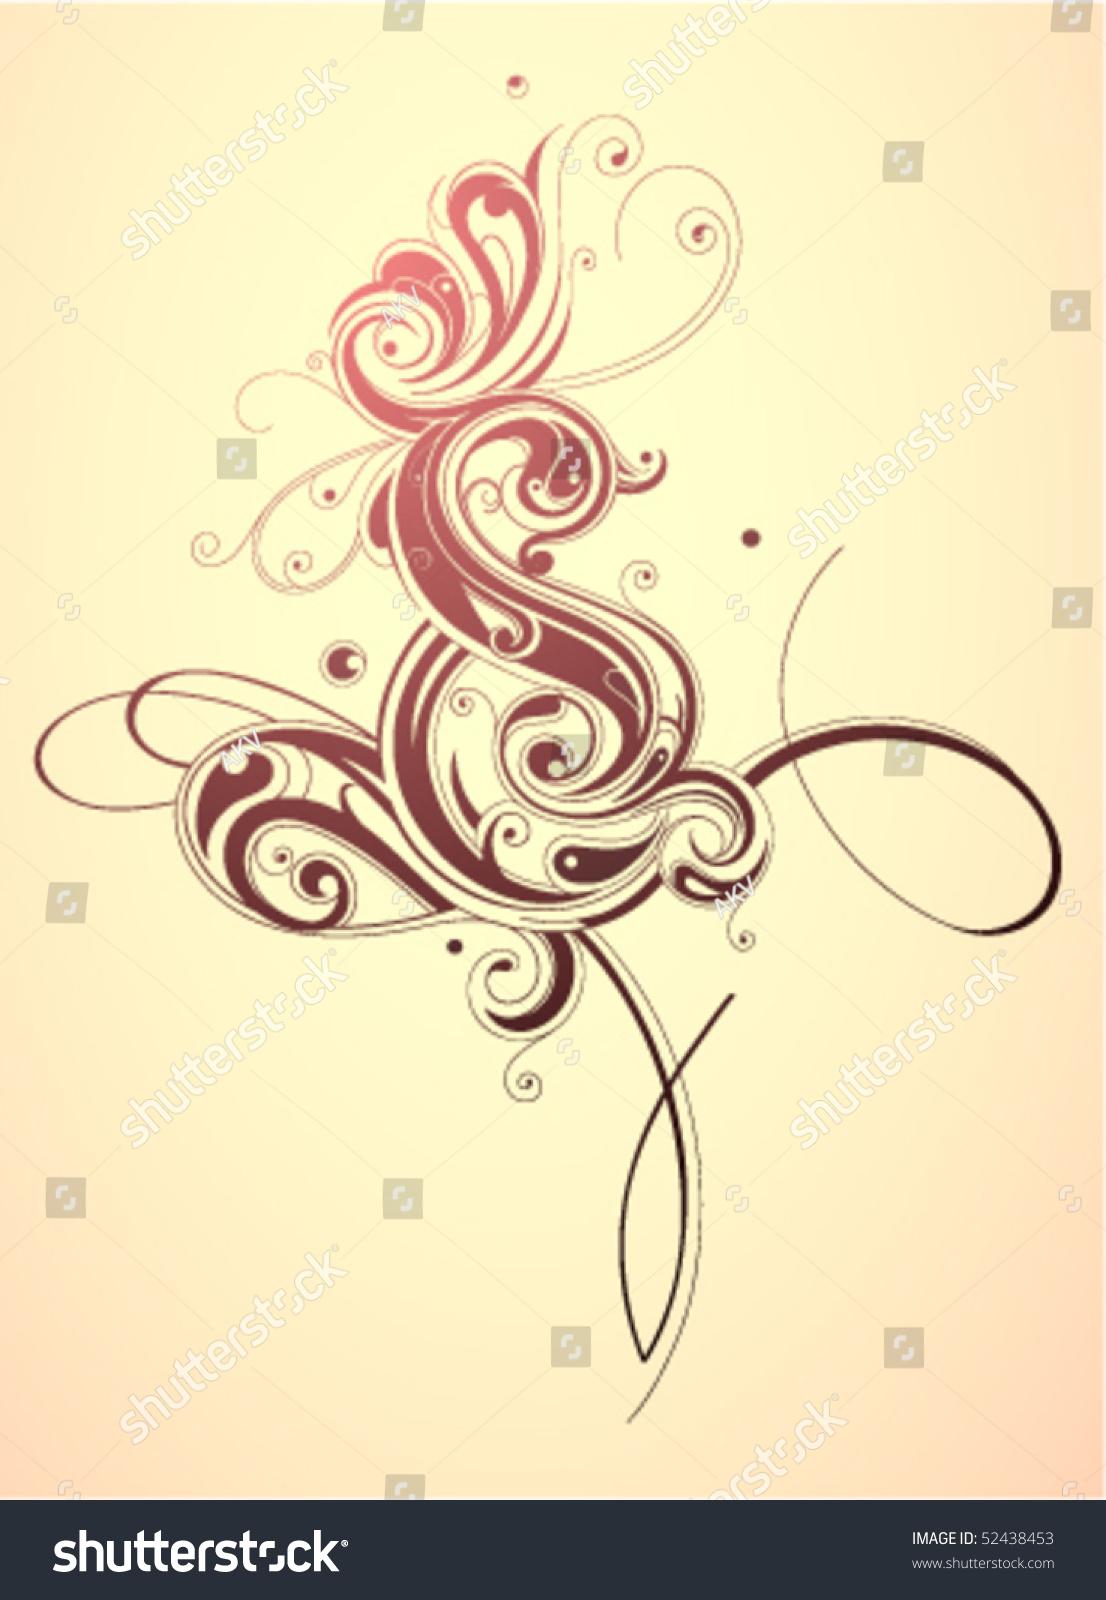 Artistic Calligraphy Swirls Stock Vector Illustration